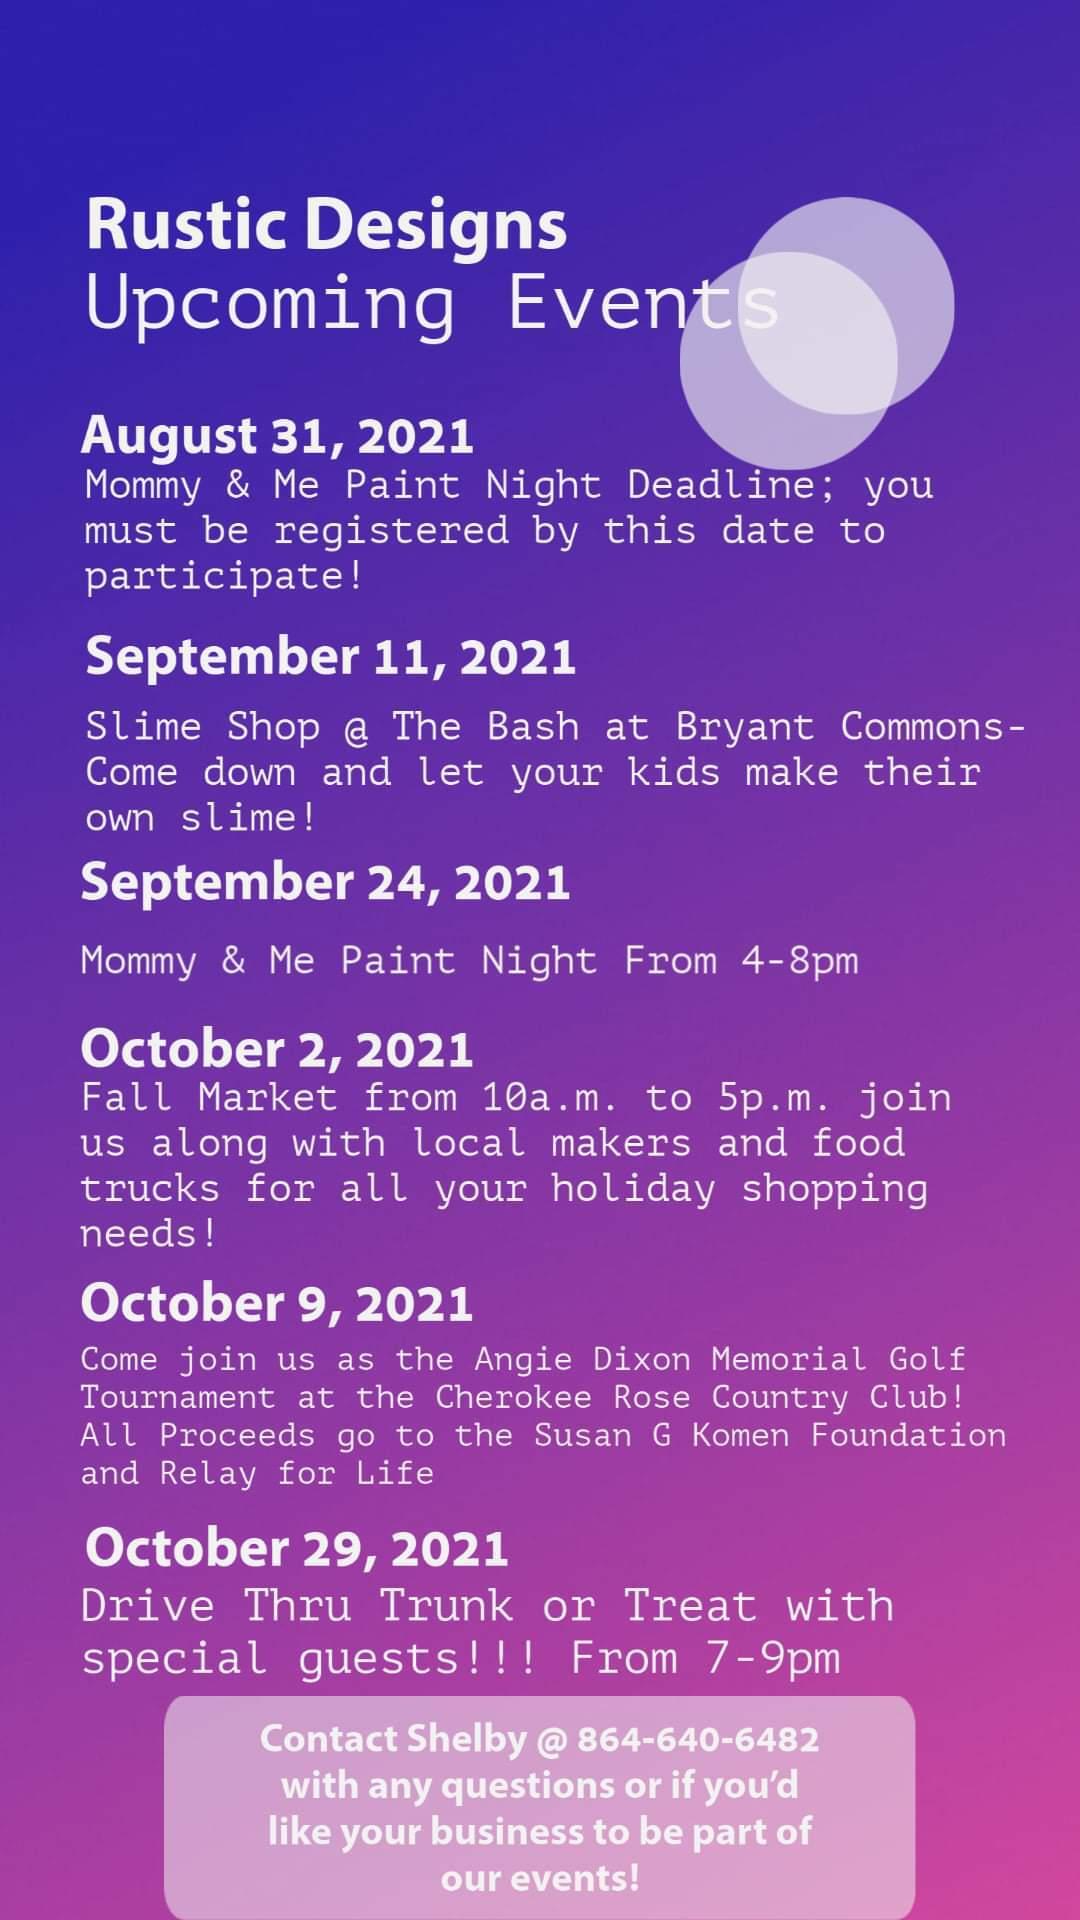 Rustic Designs Event Calendar